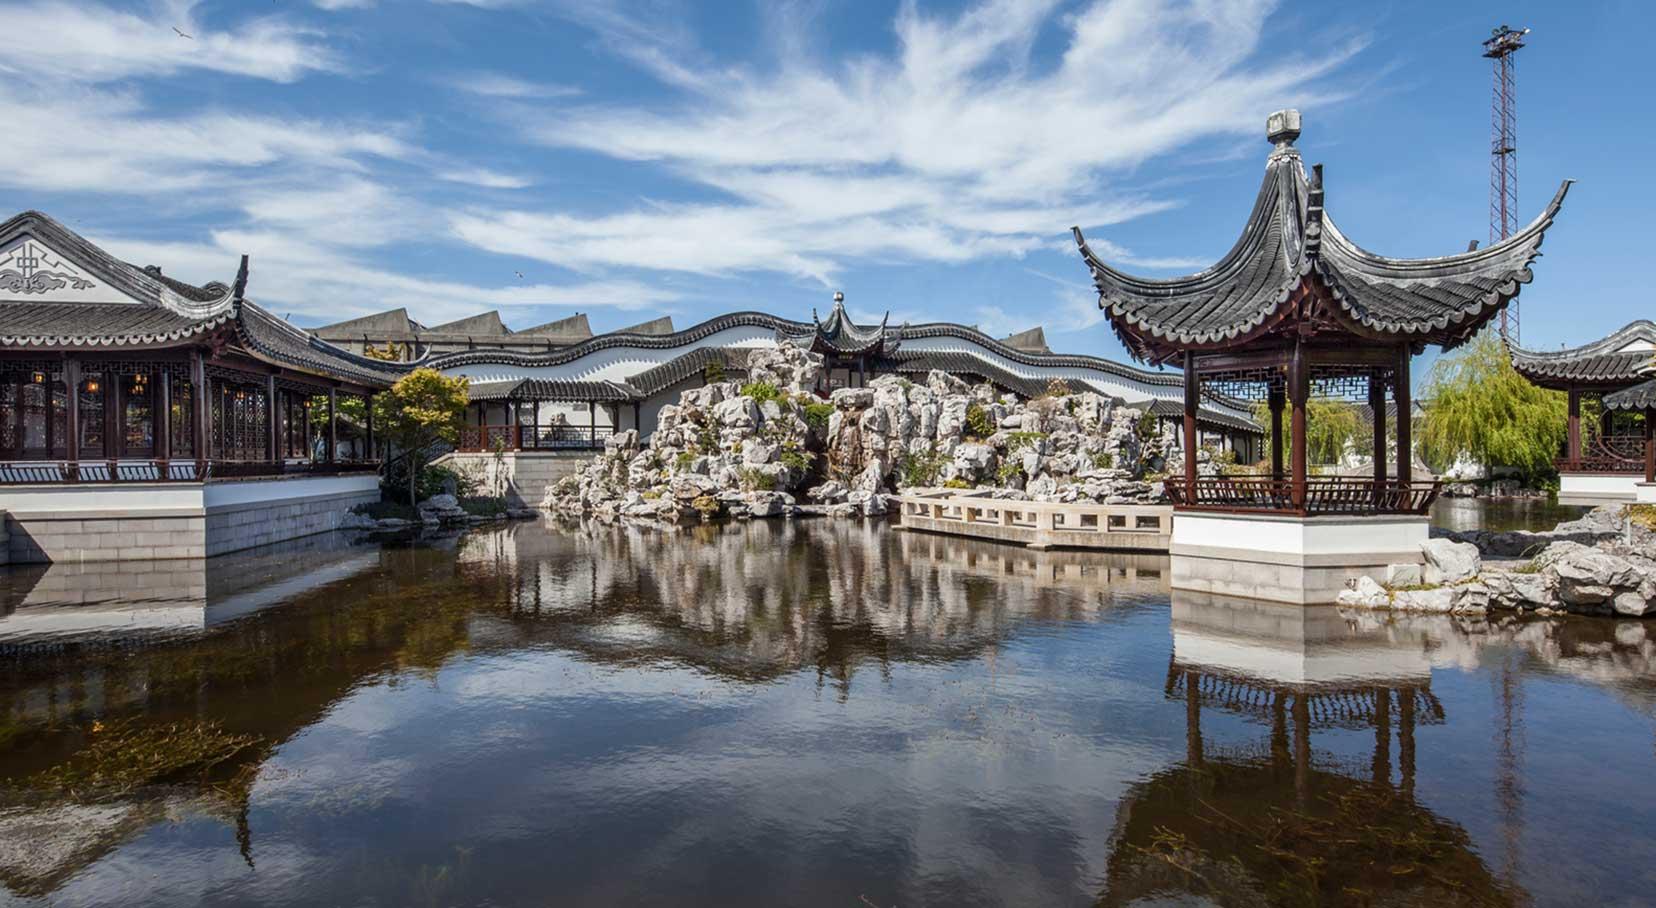 Dunedin Chinese Garden - Tours